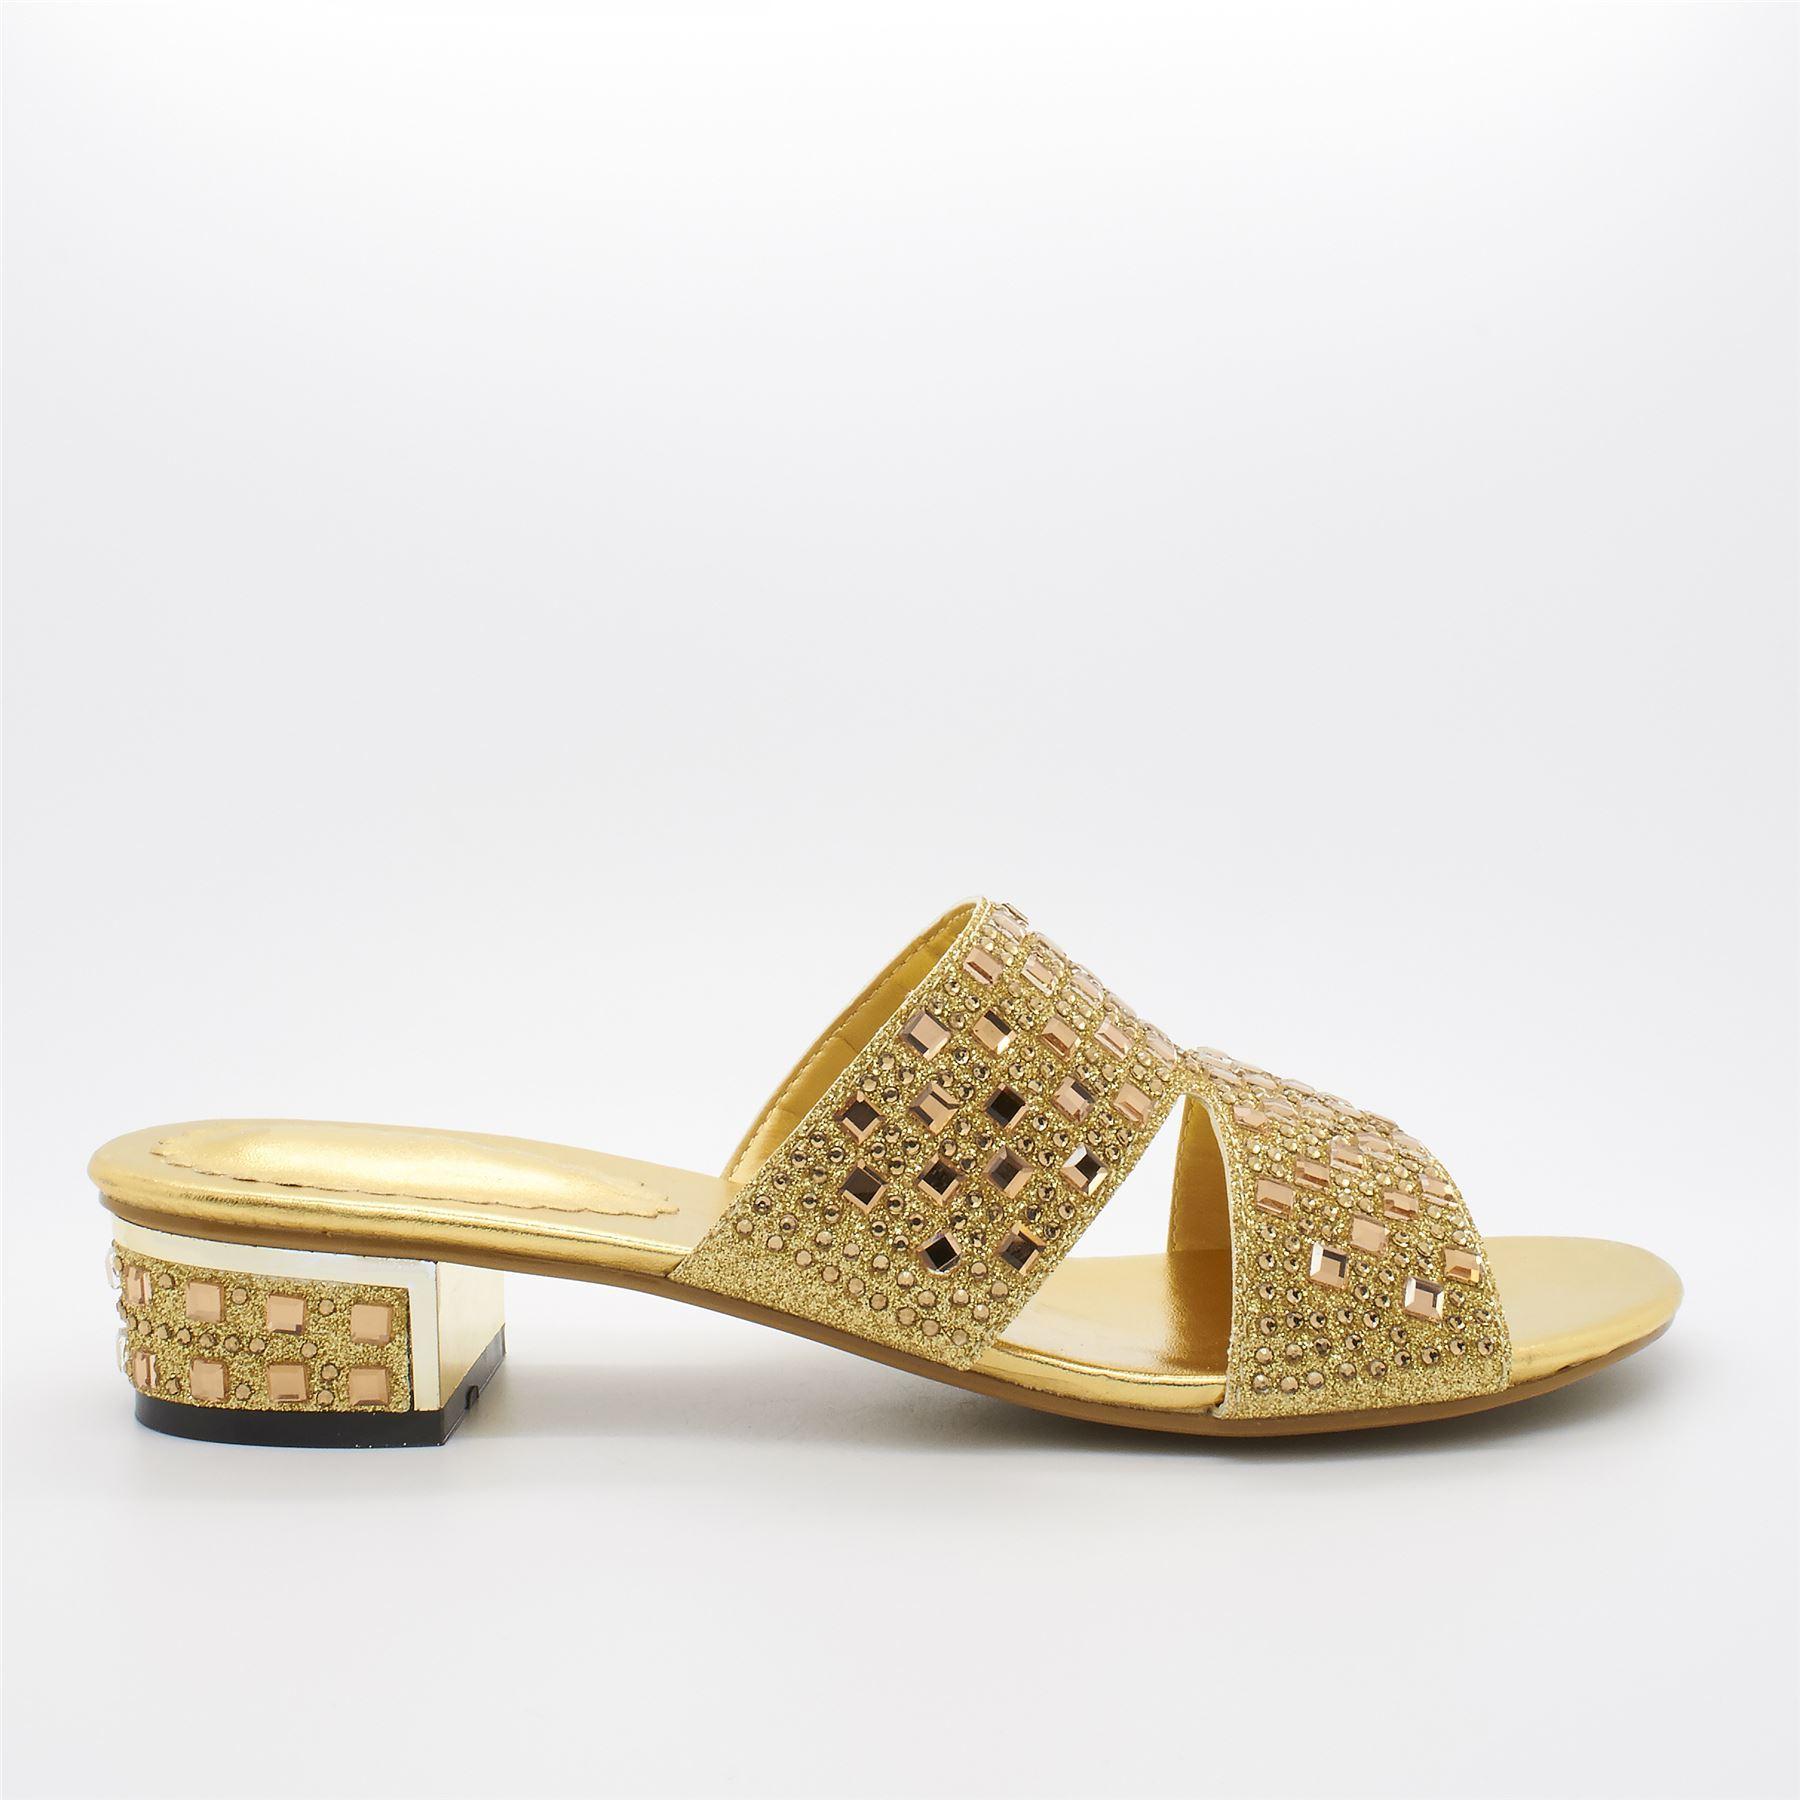 Womens Ladies Low Strappy Mules Sandals Evening Size Heel Diamante Block Slip On